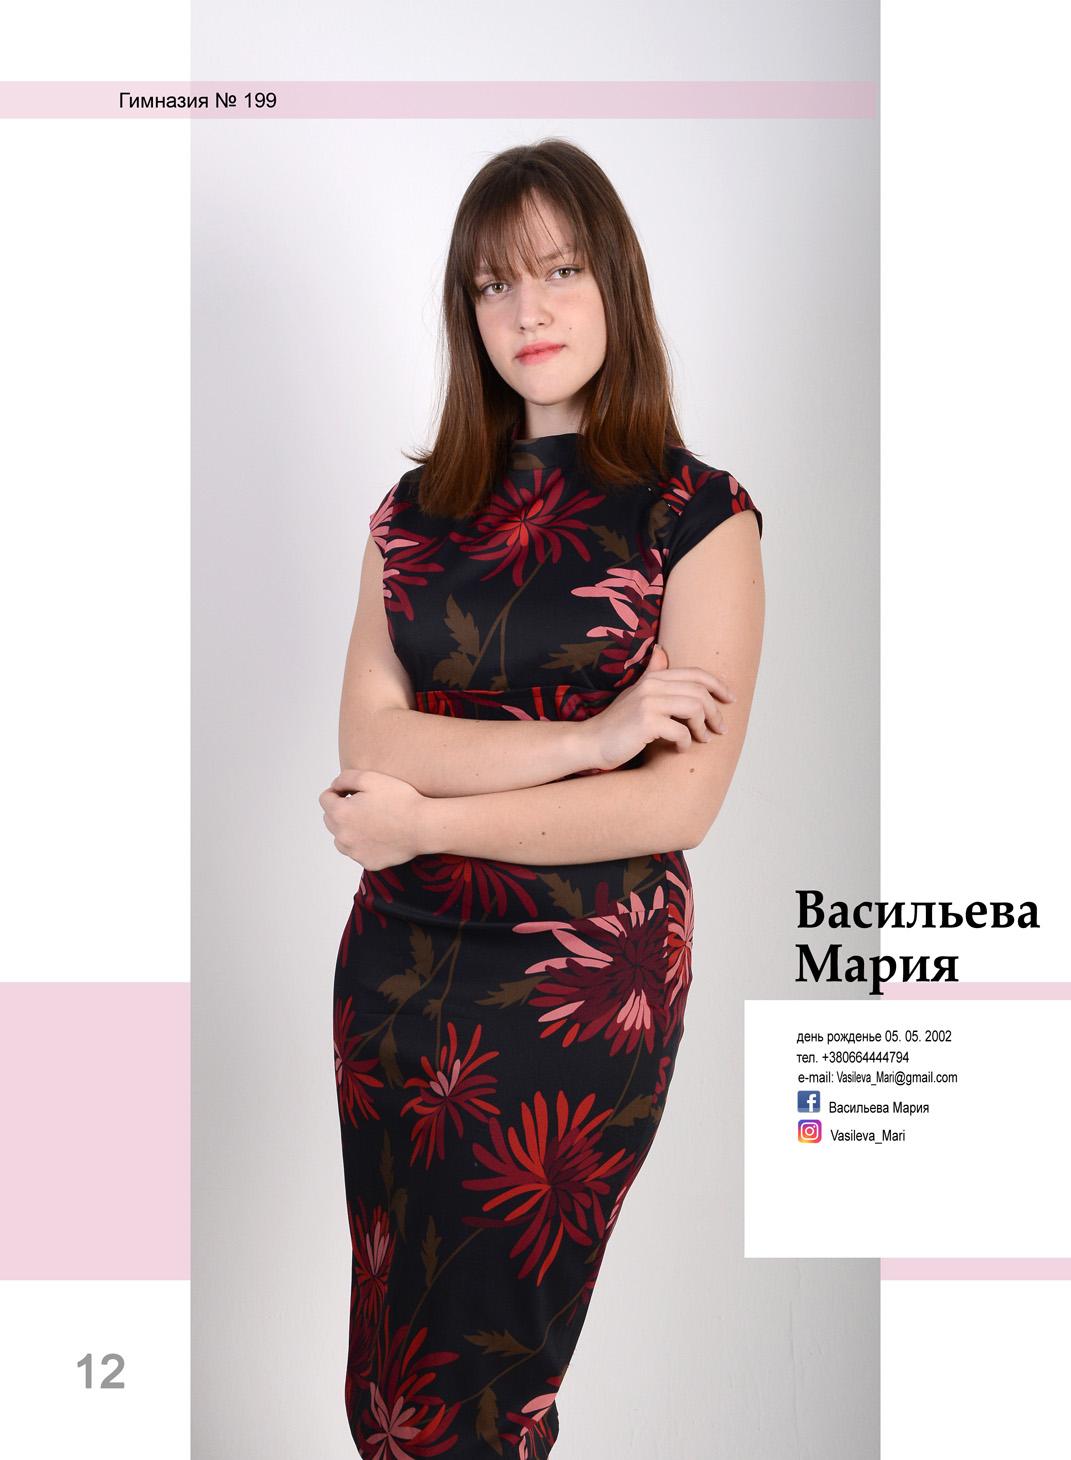 https://school-photo.com.ua/wp-content/uploads/2019/09/14-copy-1.jpg